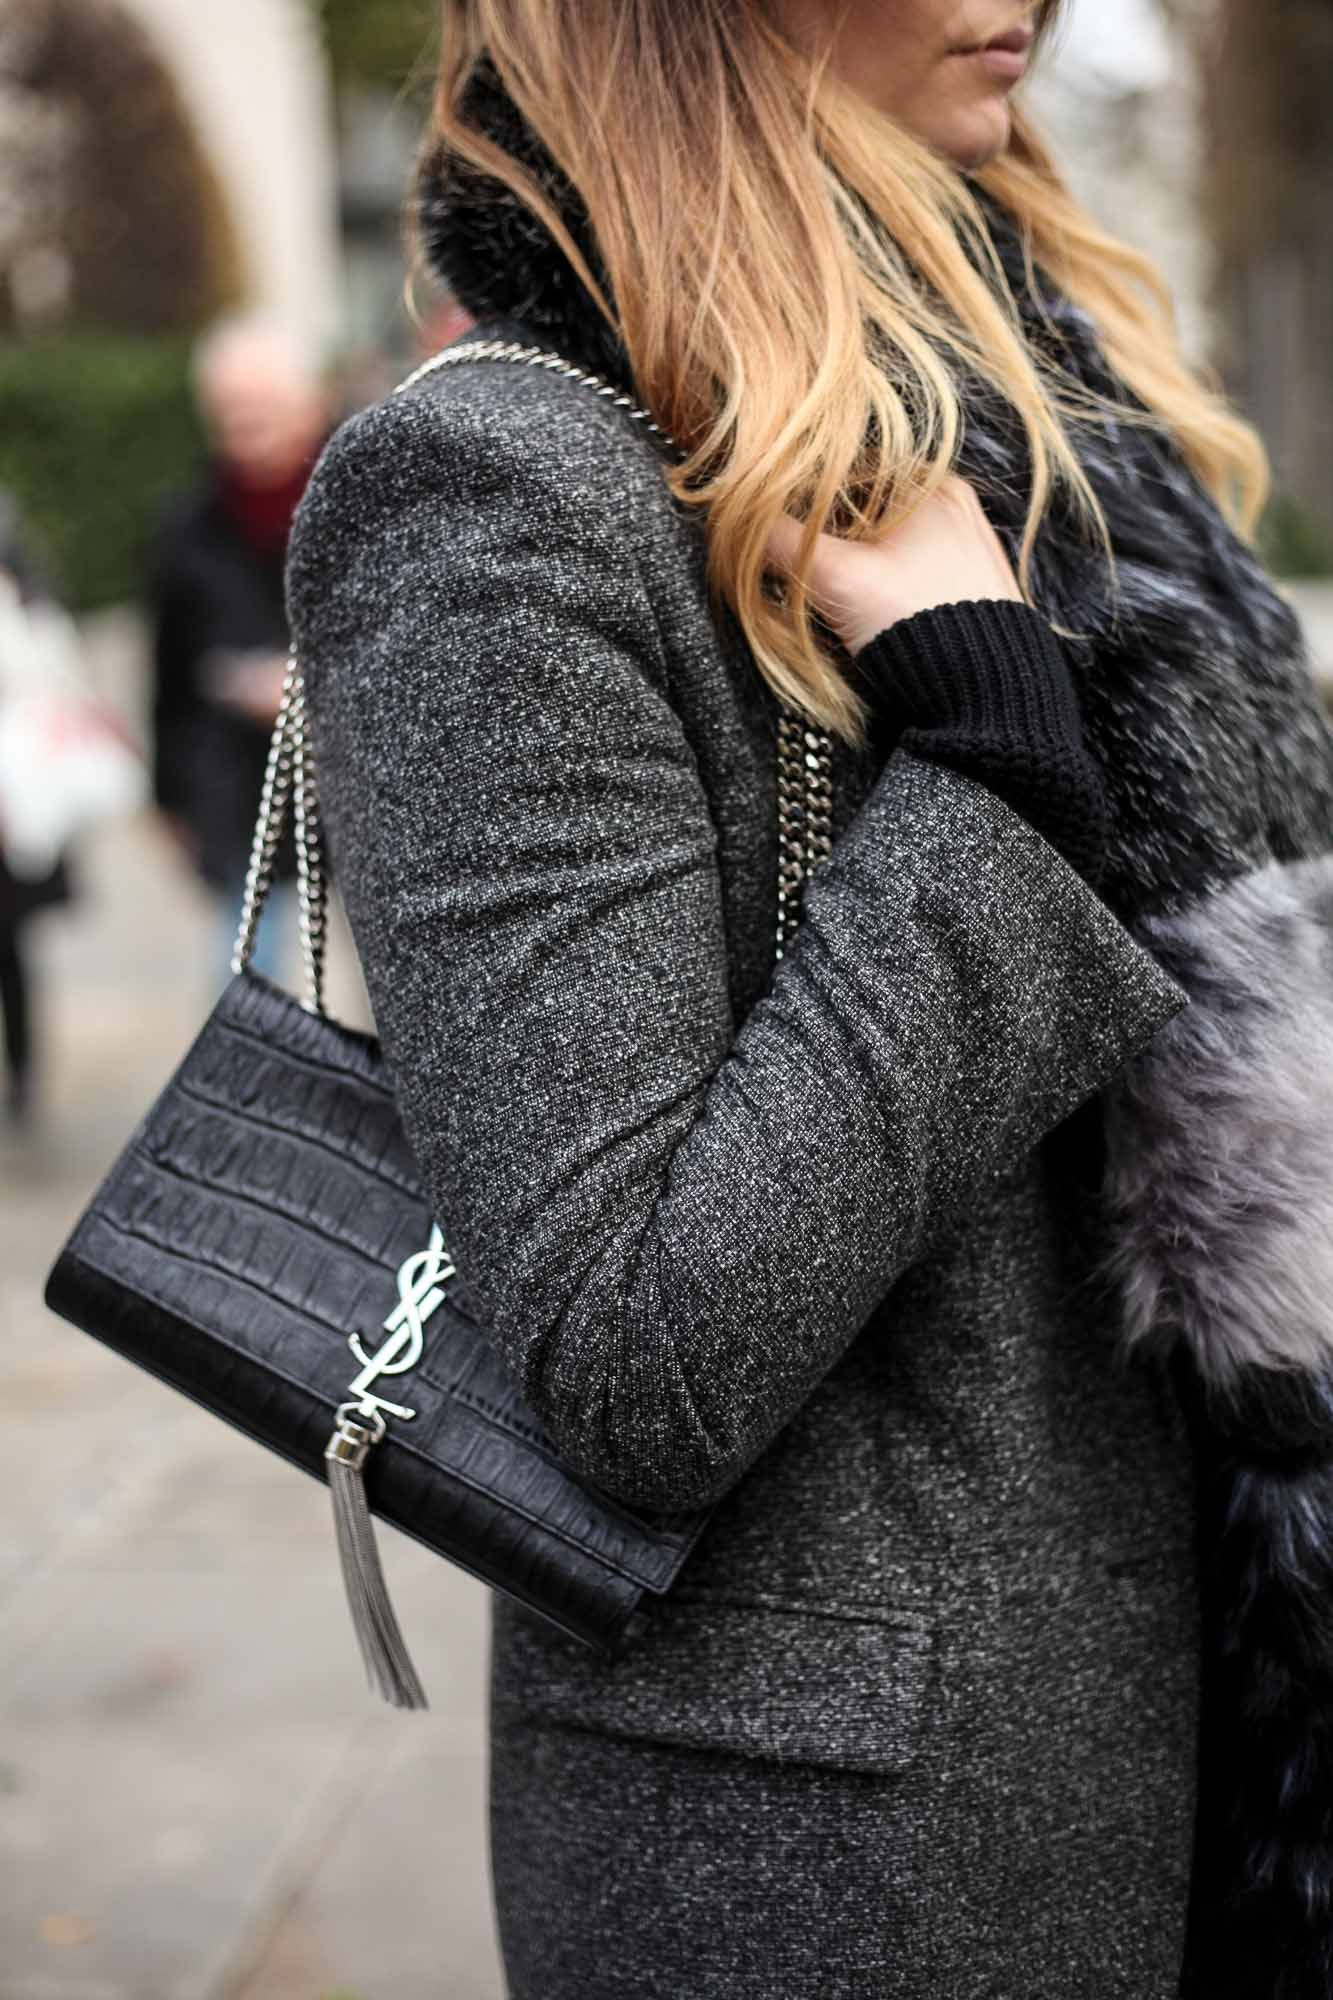 YSL black croc tassel bag in silver  8909cca732e16